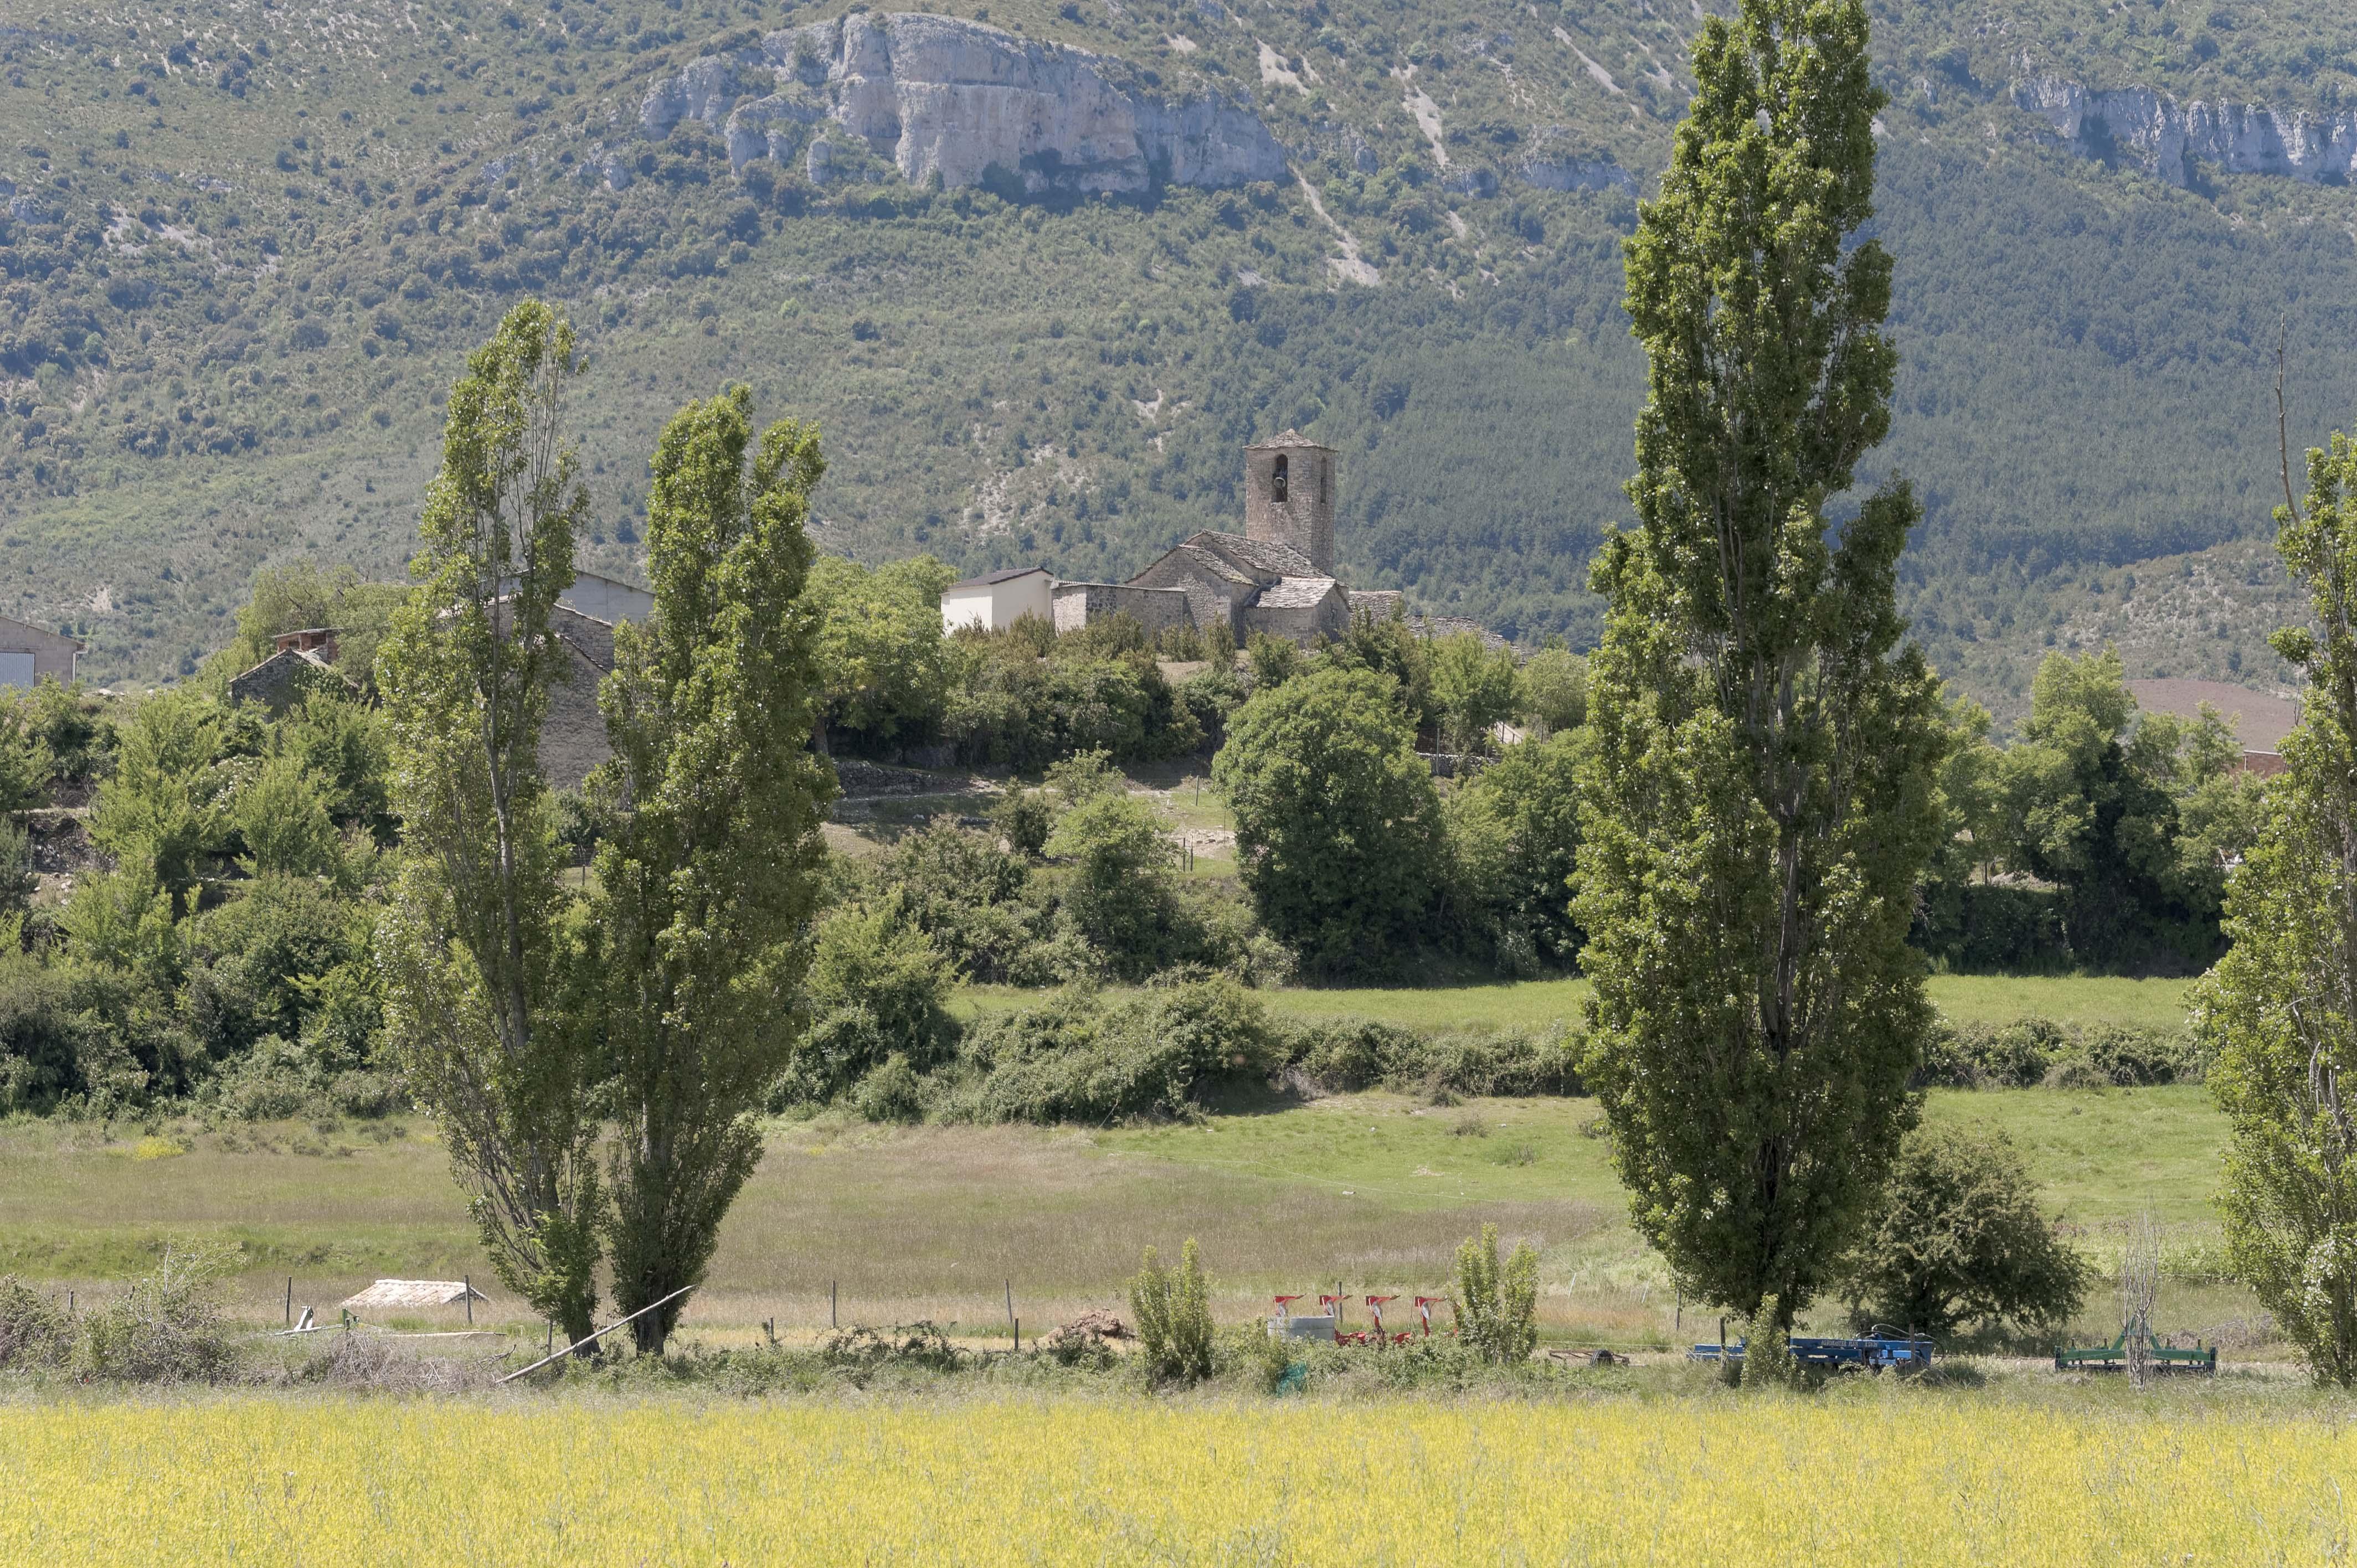 6769_Paules de Sarsa (Sobrarbe)